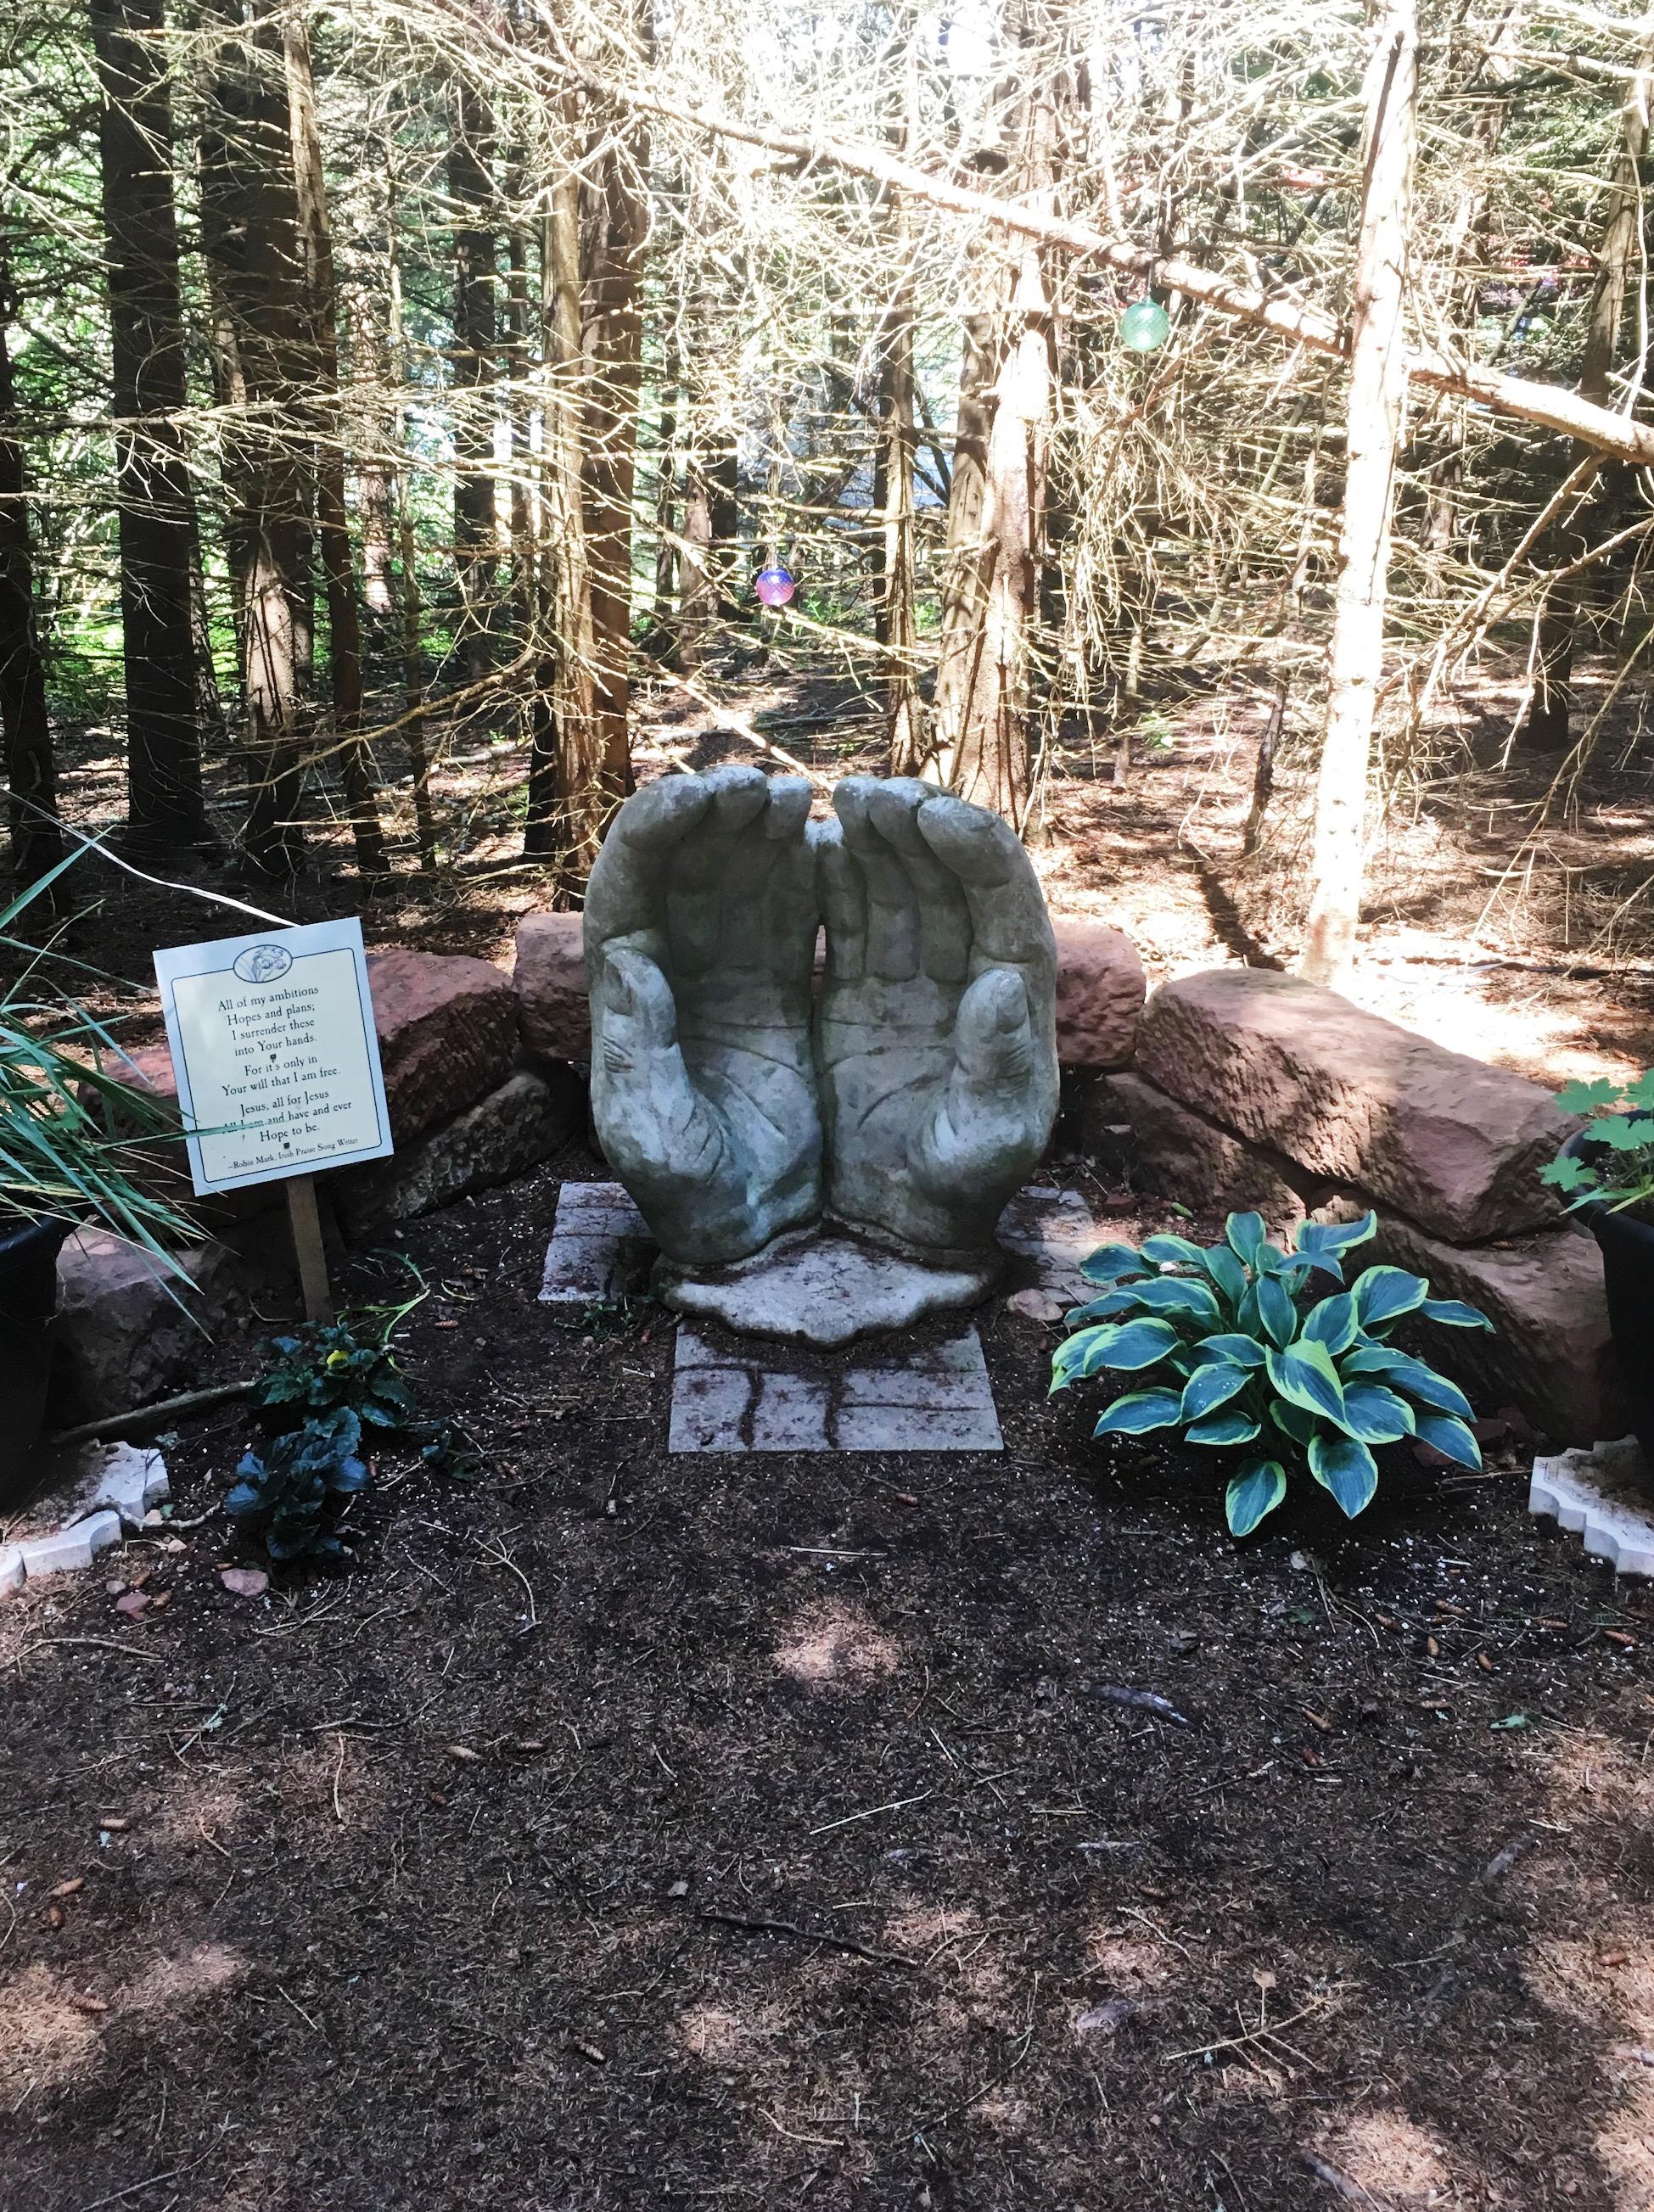 gardens-of-hope-prince-edward-island-1